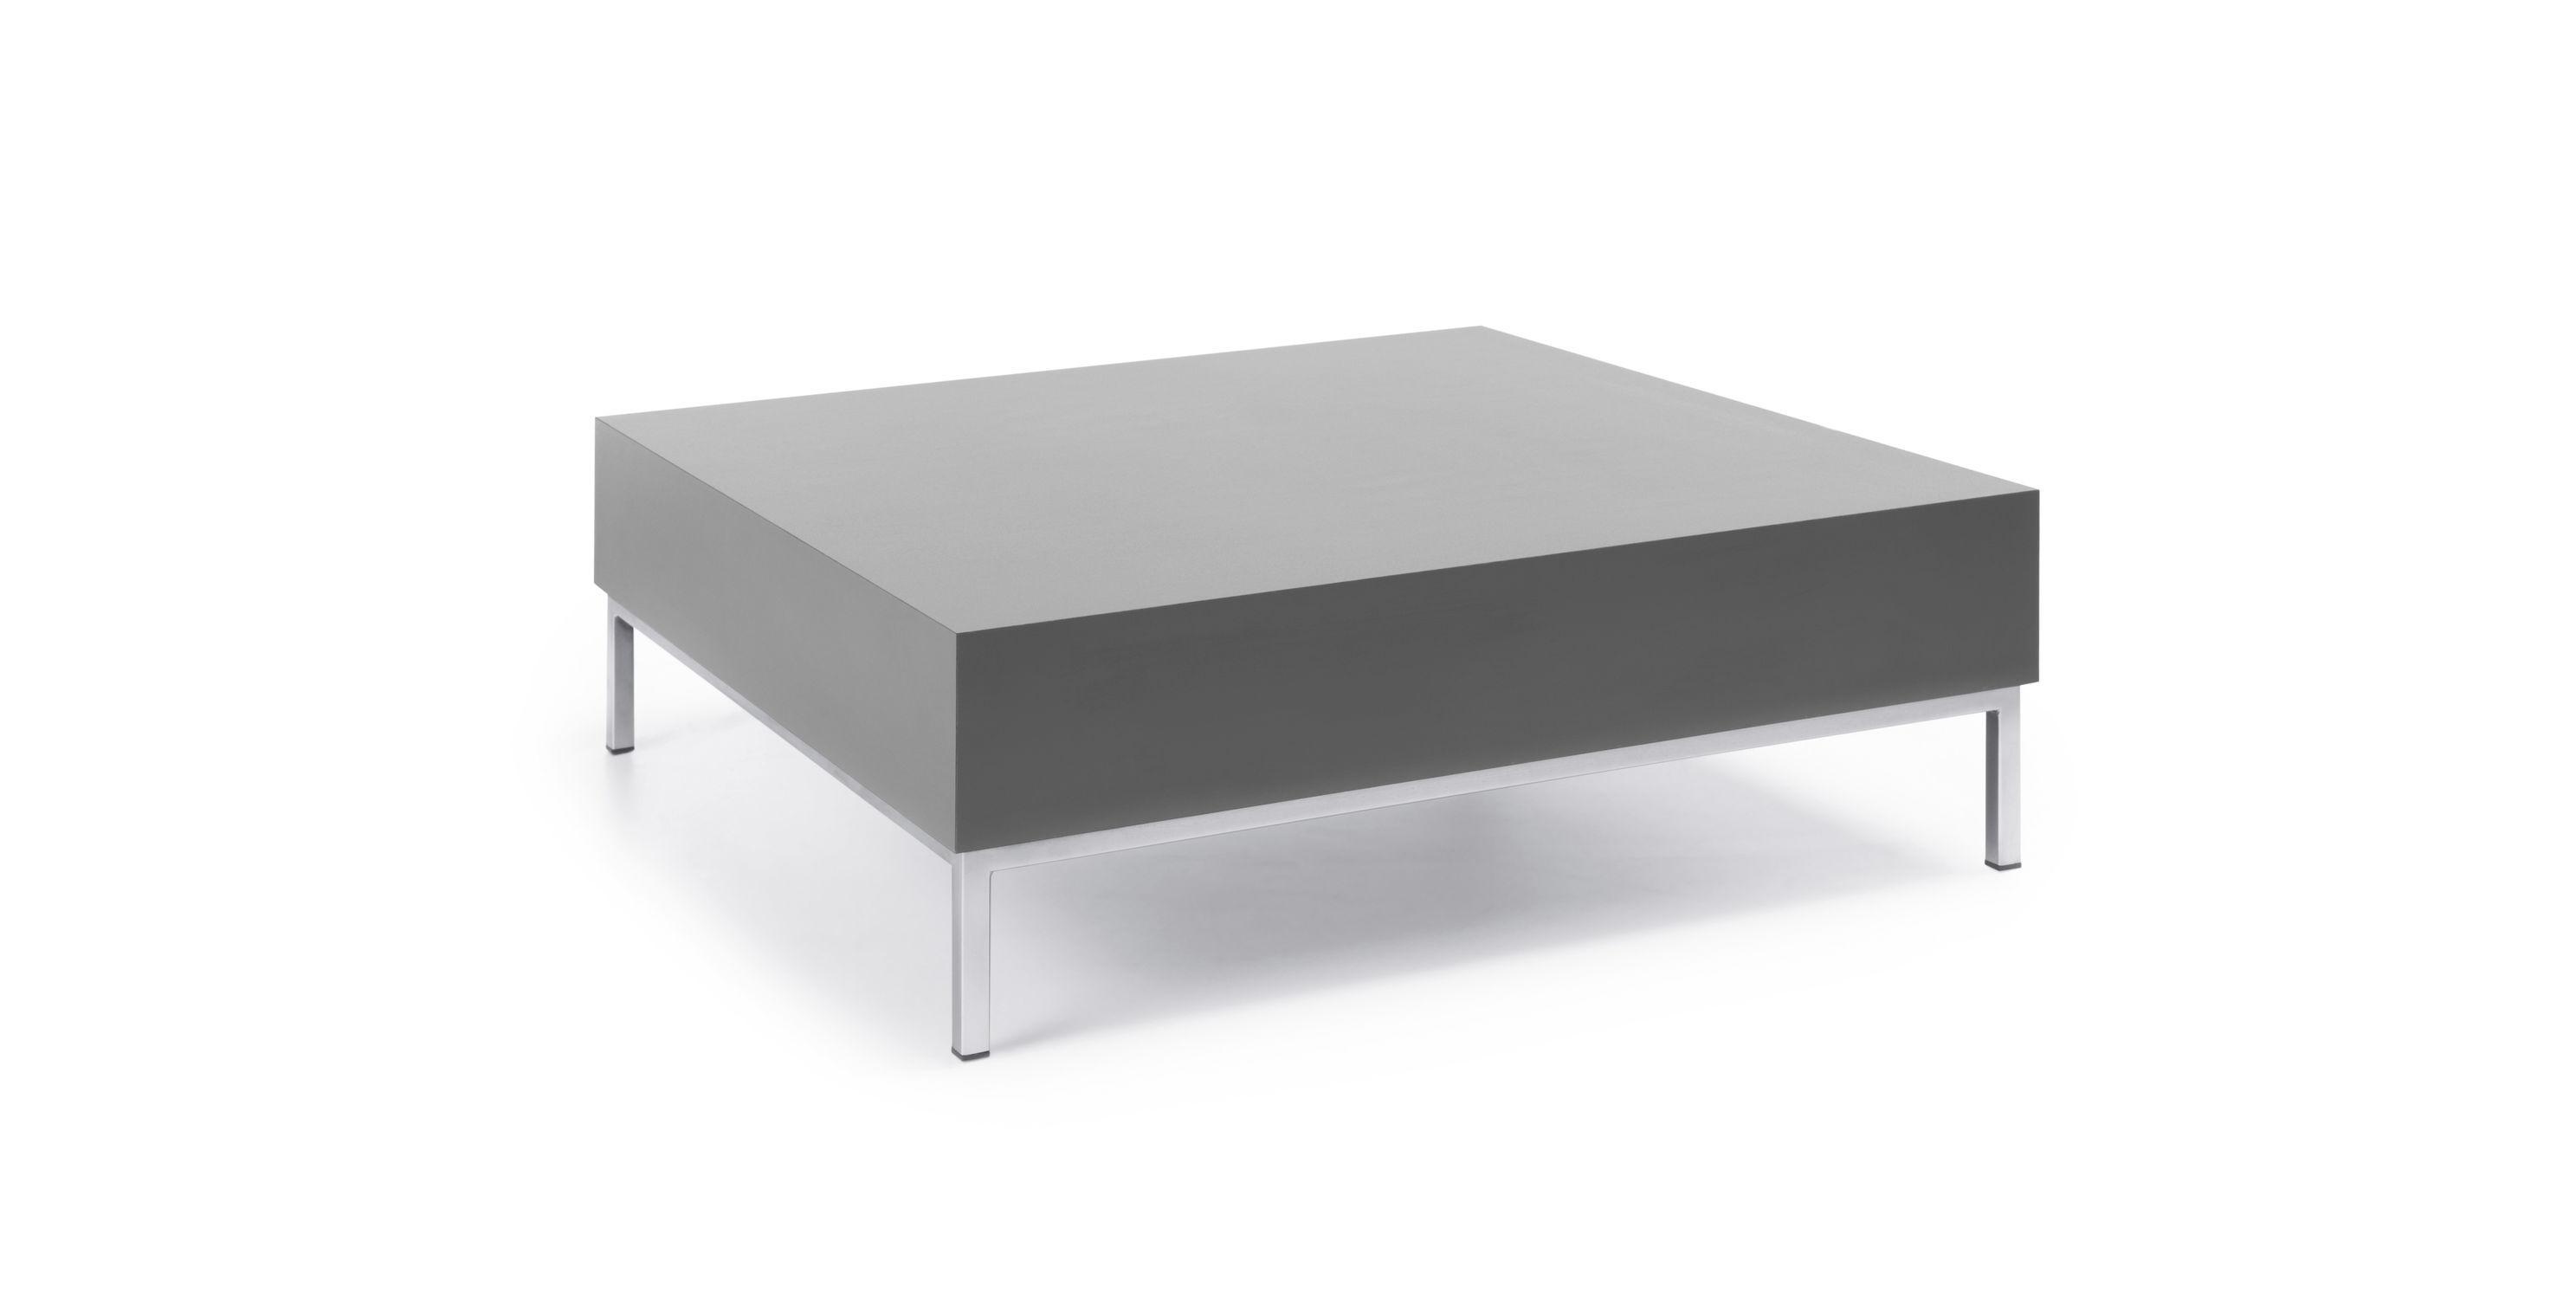 Contemporary coffee table metal oak teak MYTURN by Paul